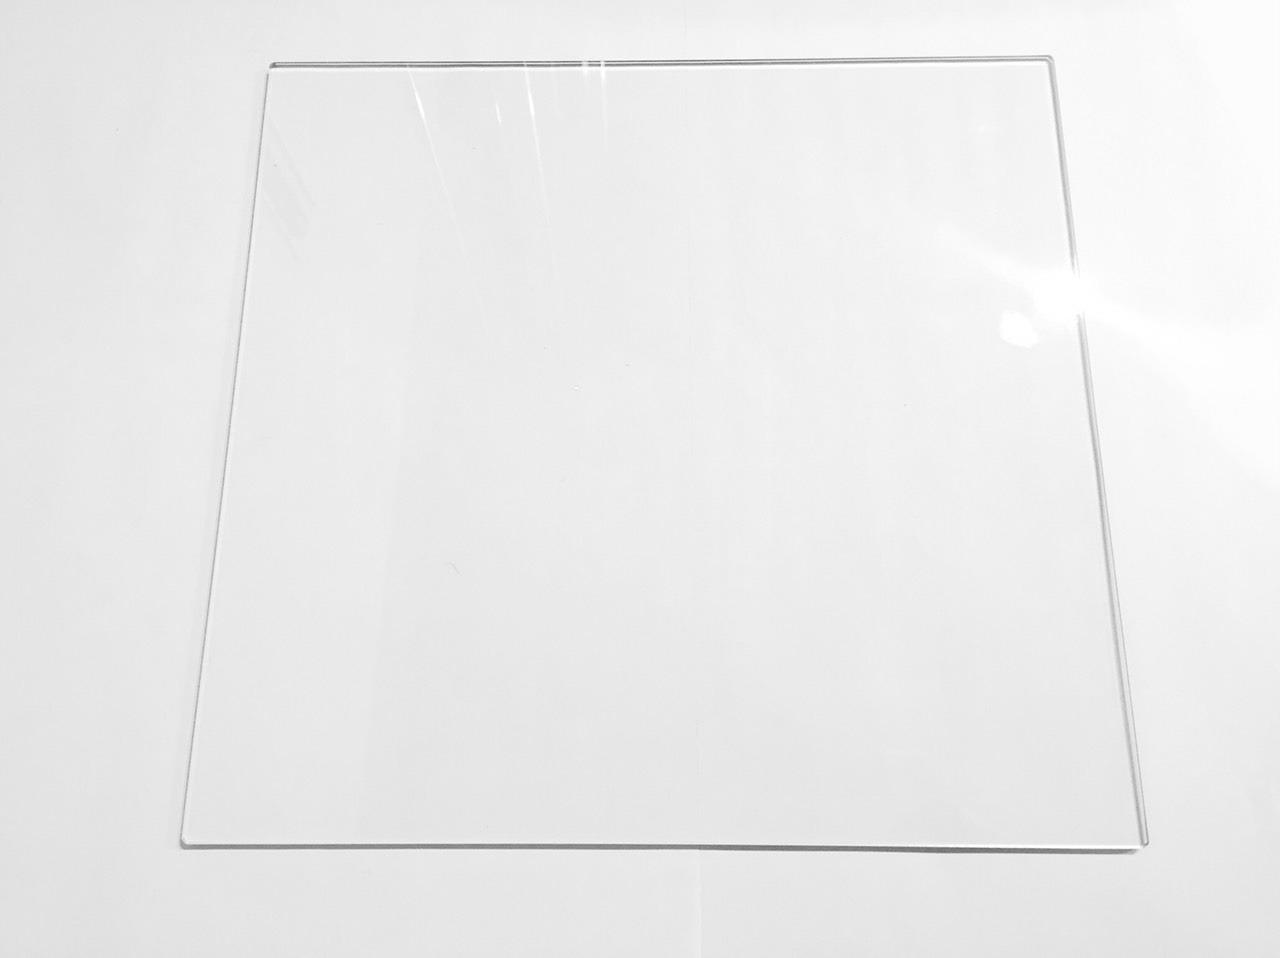 Lepton用 プリント用ガラス - 画像1